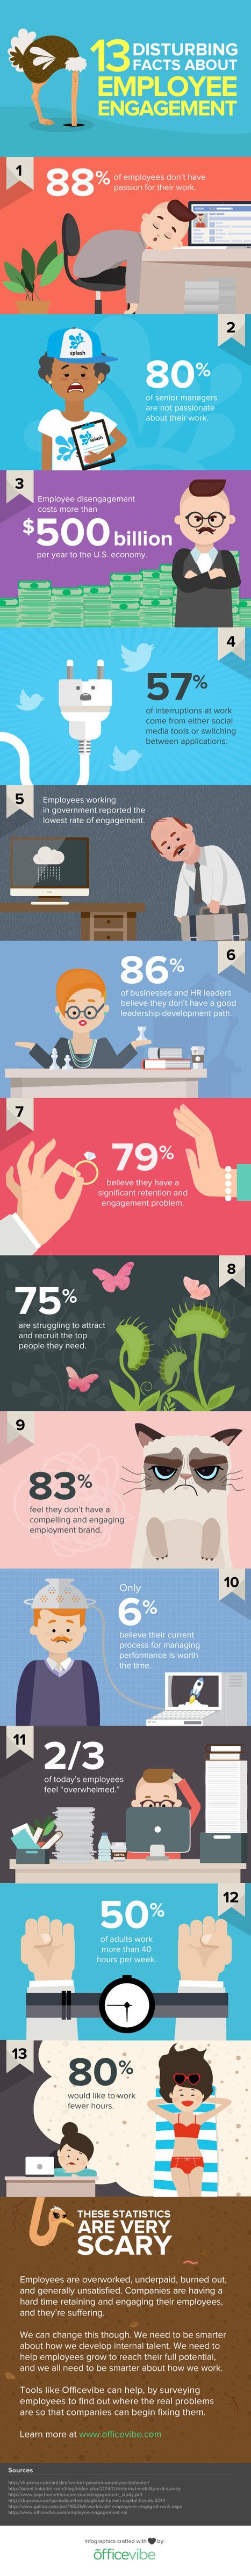 Employee Engagement | Managing performance | Scoop.it